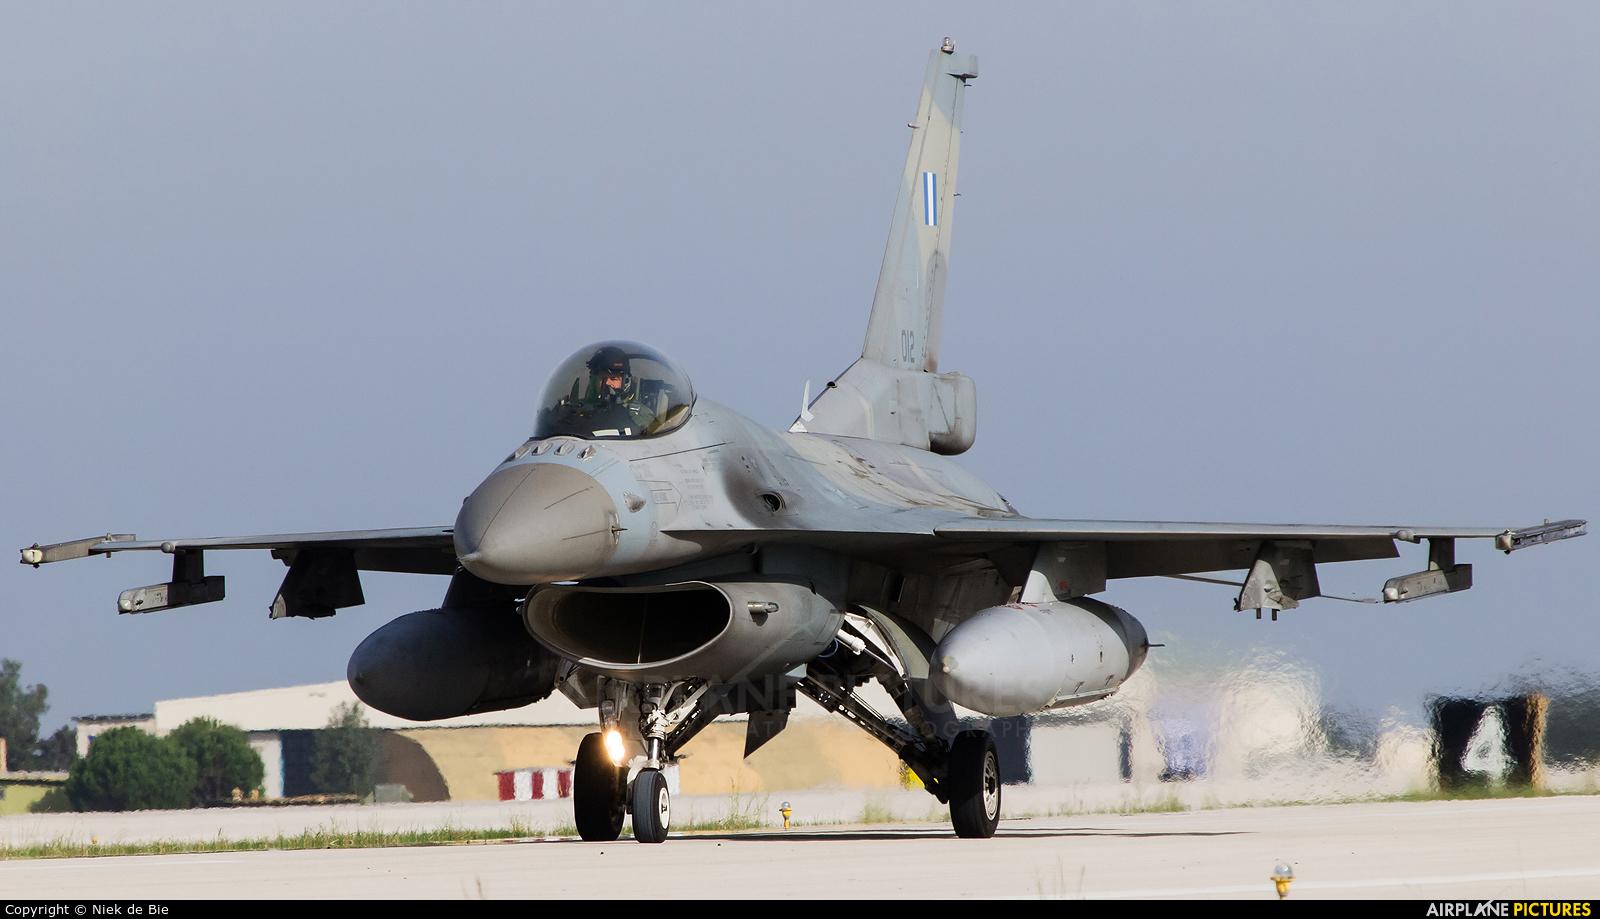 Greece - Hellenic Air Force 012 aircraft at Araxos